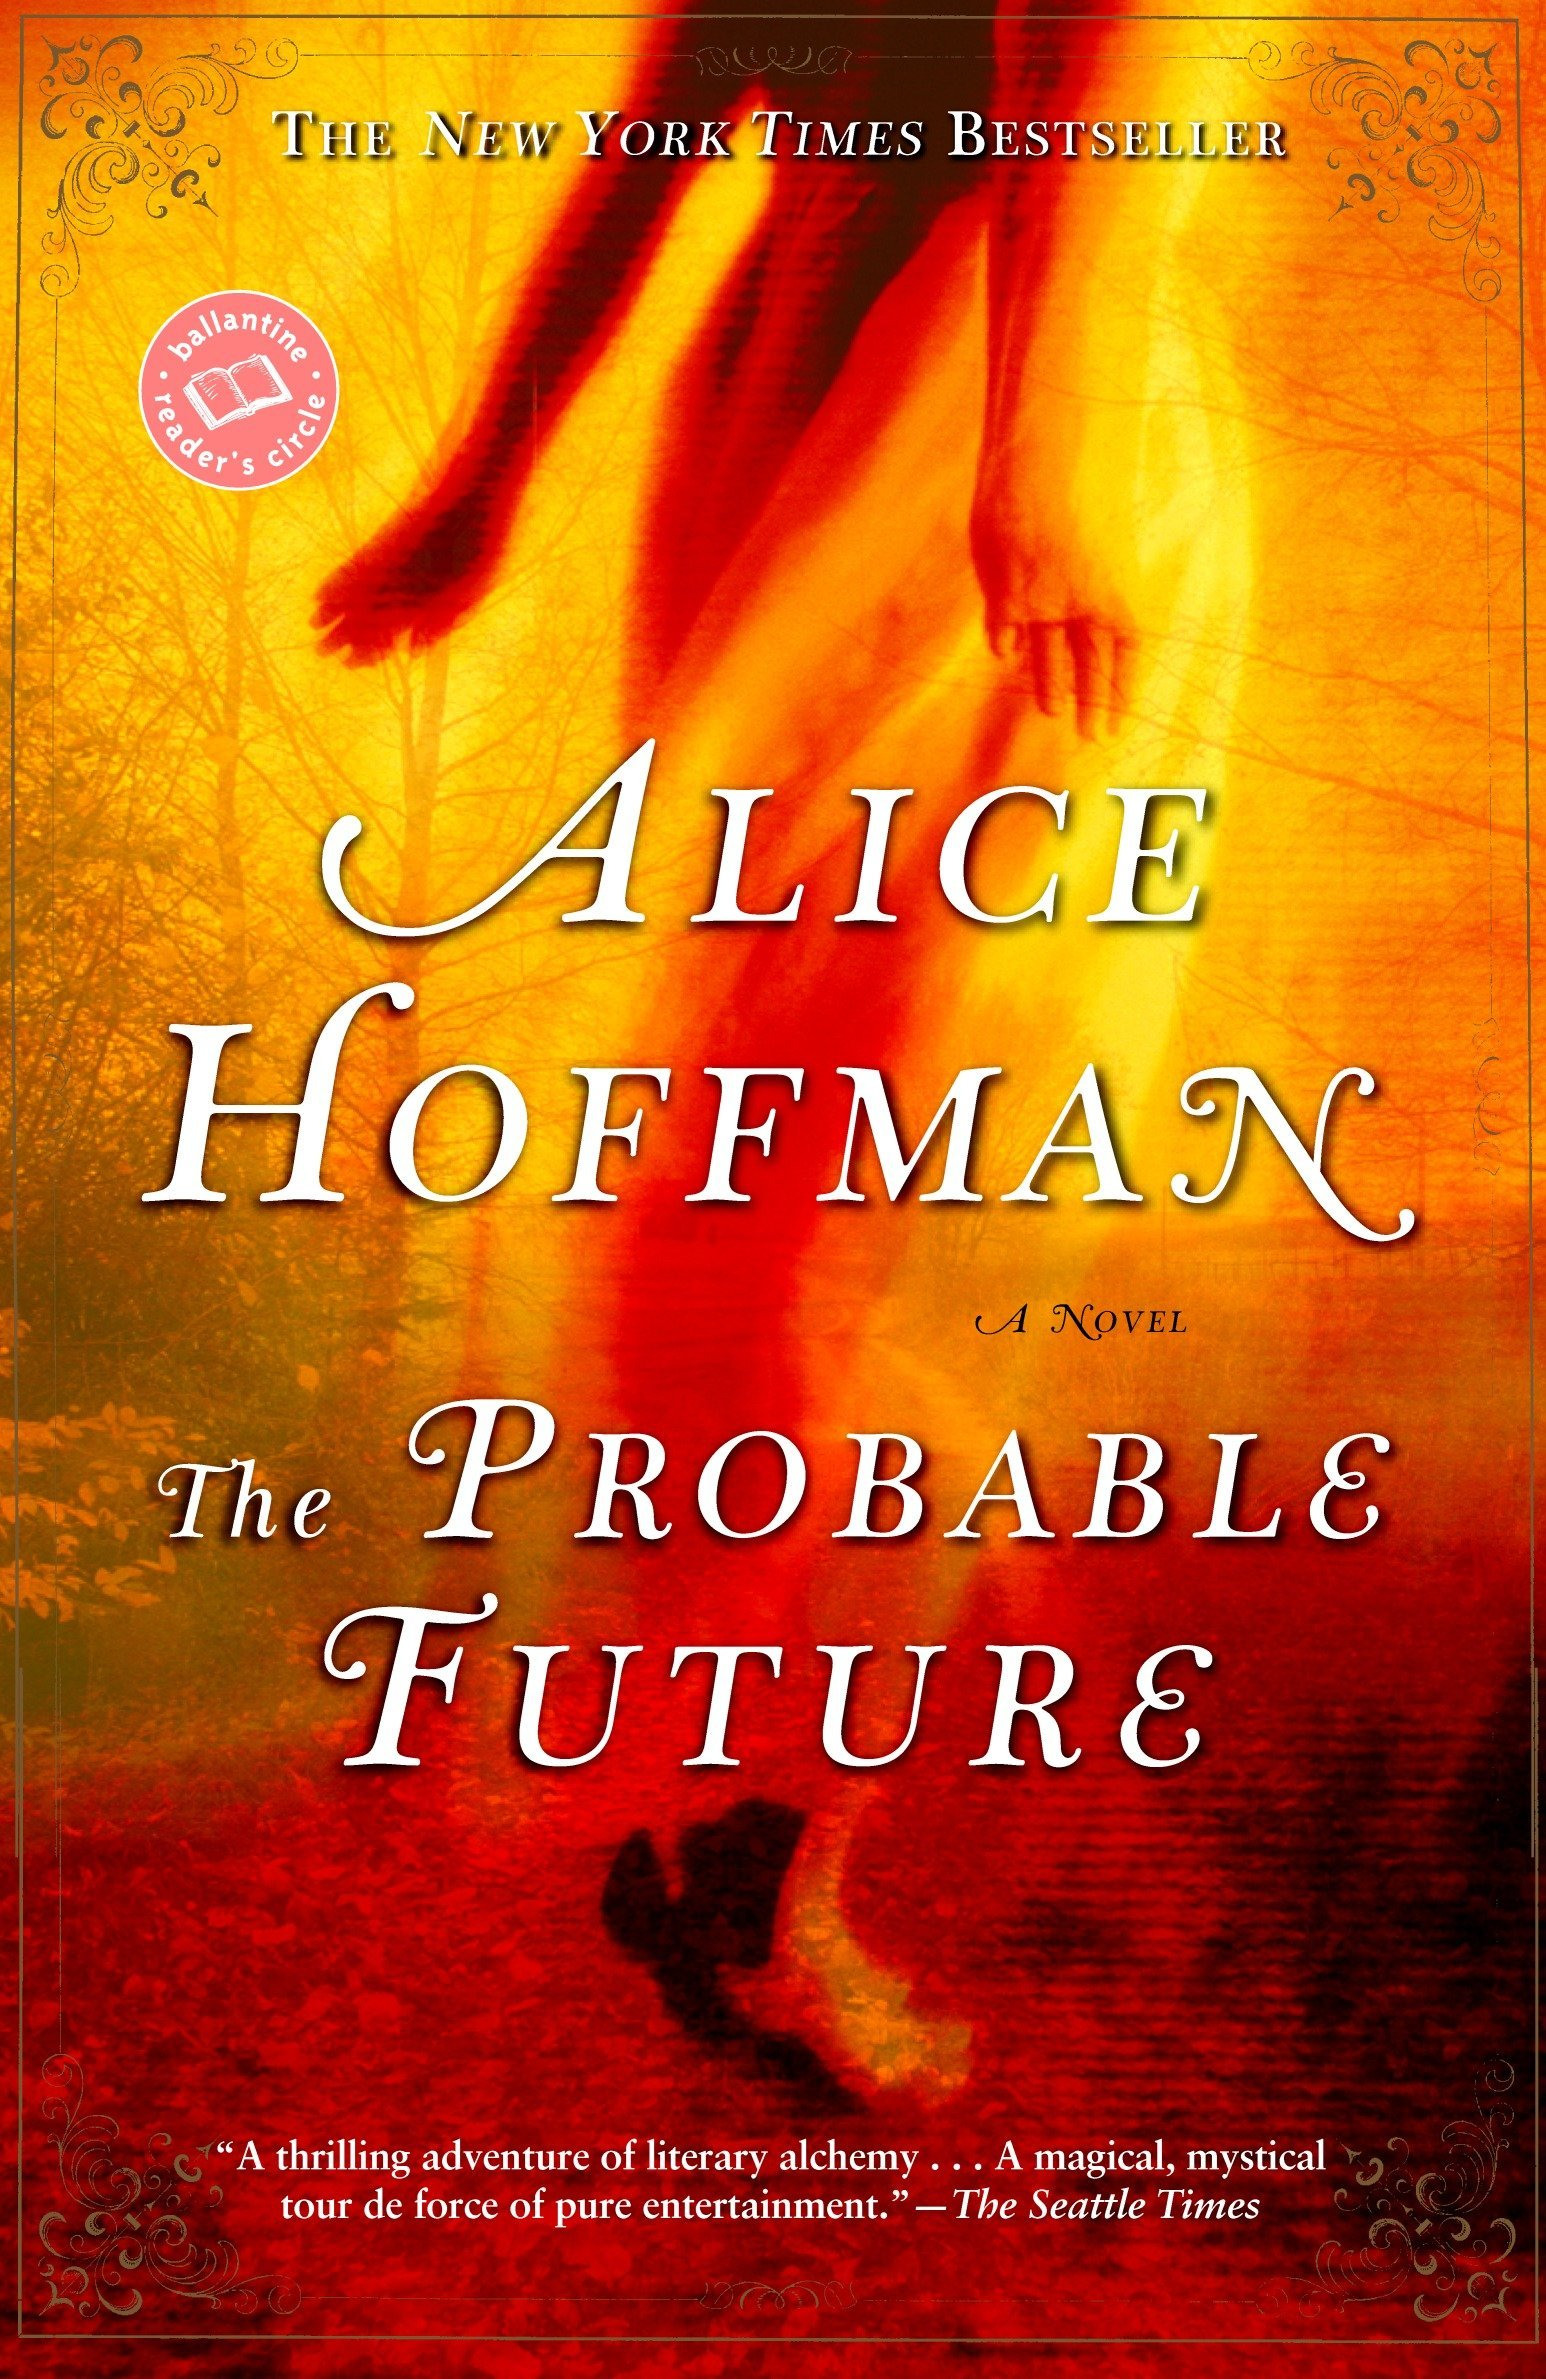 Download The Probable Future: A Novel (Ballantine Reader's Circle) pdf epub